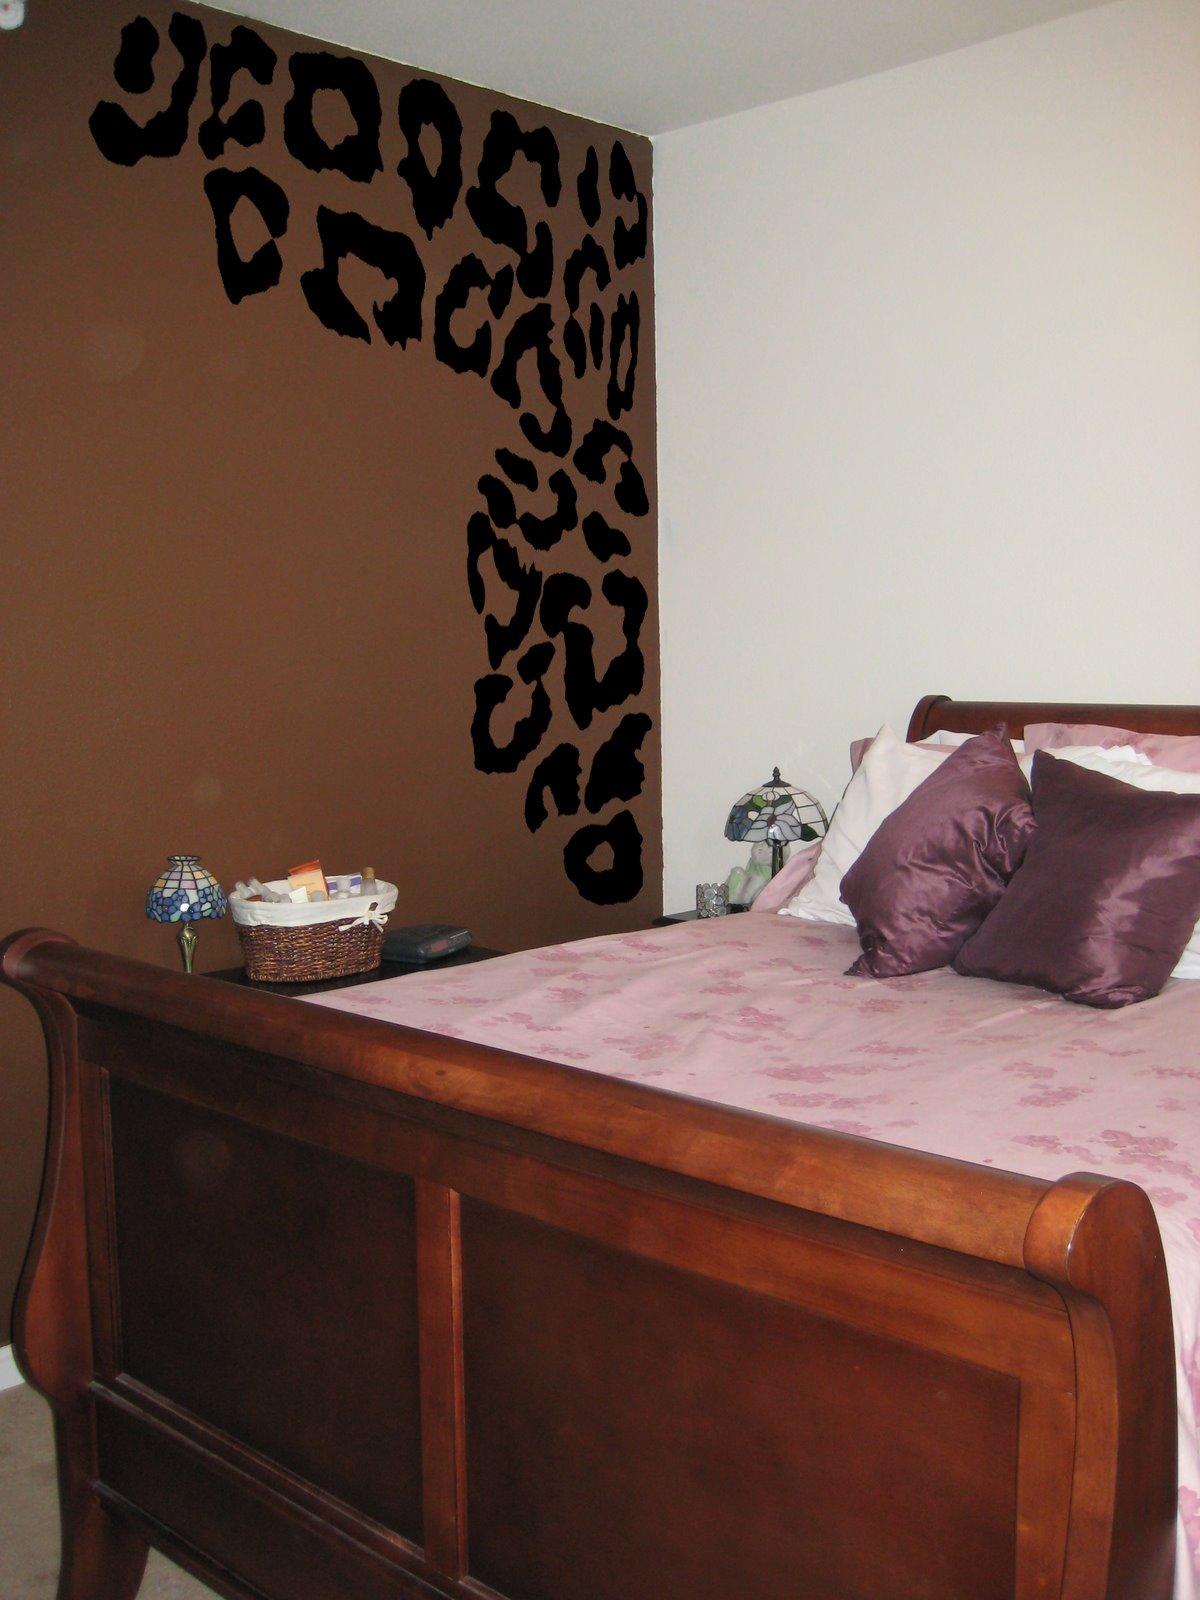 Leopard Print Spots Vinyl Wall Decal Decor Cheetah Print Wall